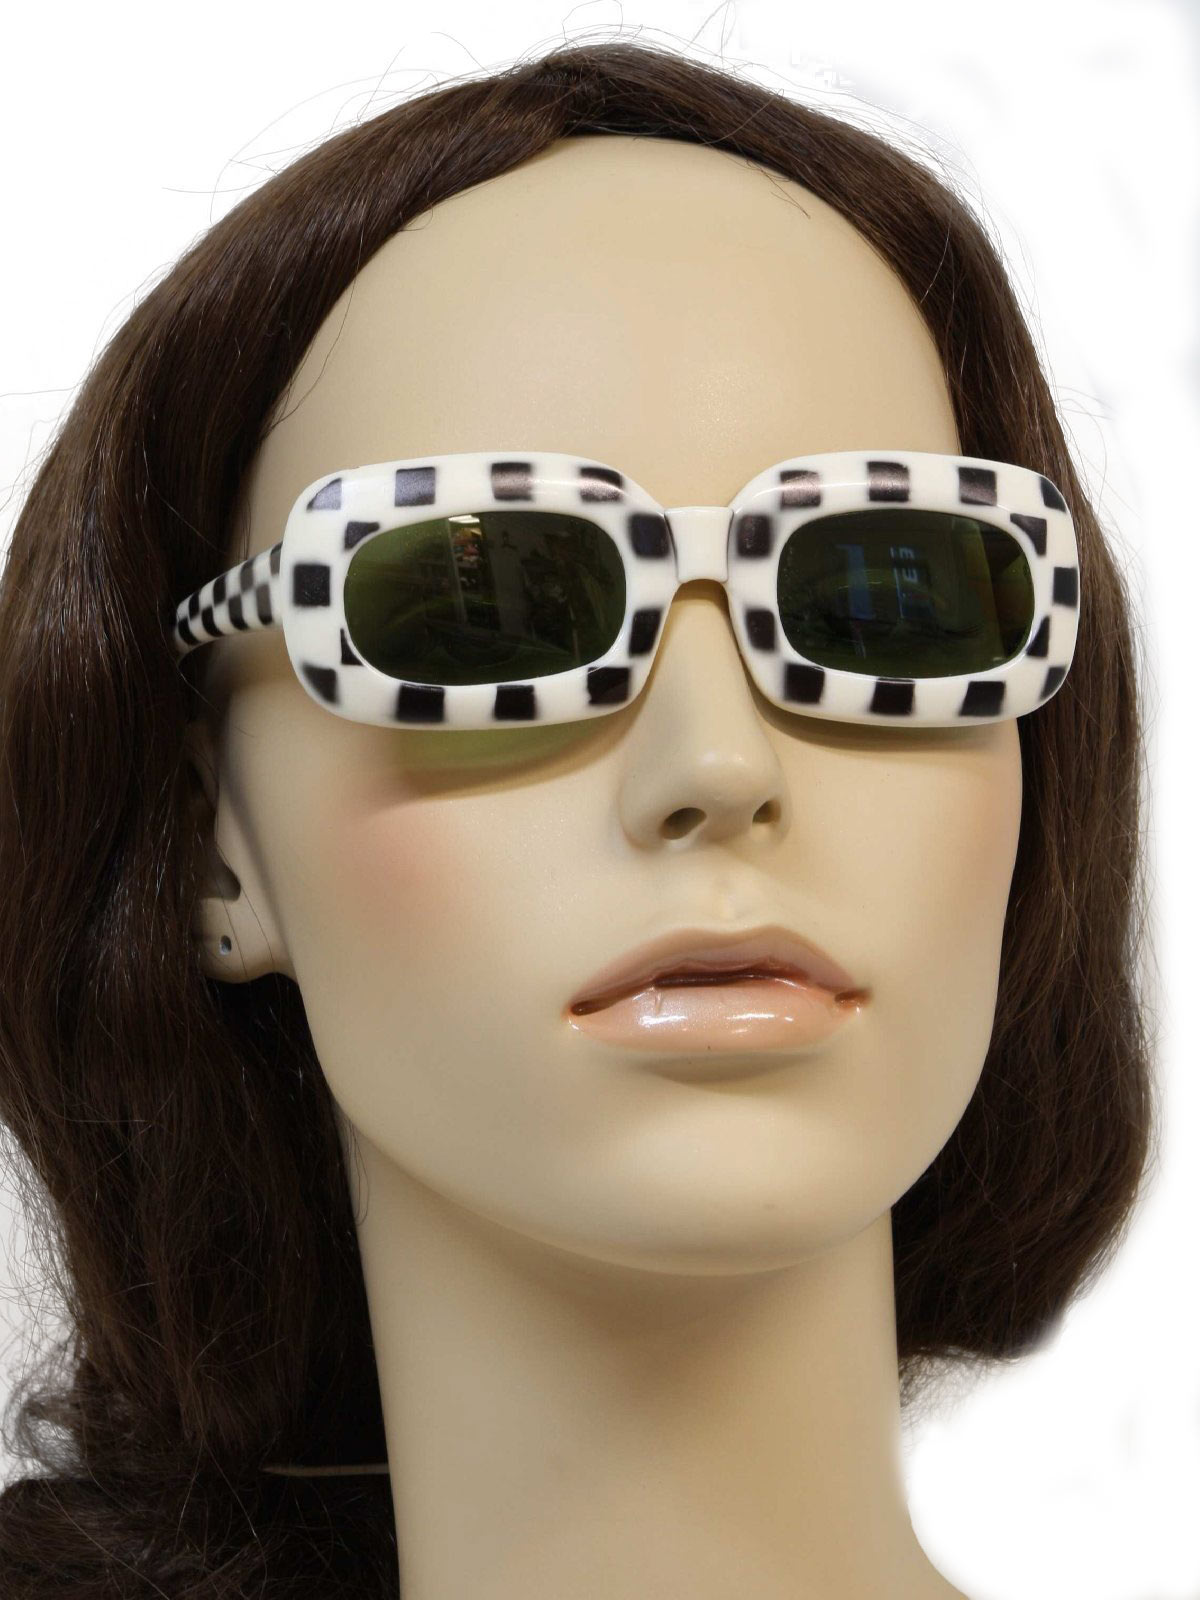 Sunglasses Tv  1960s vintage glasses 60s italia sunglasses italy womens new